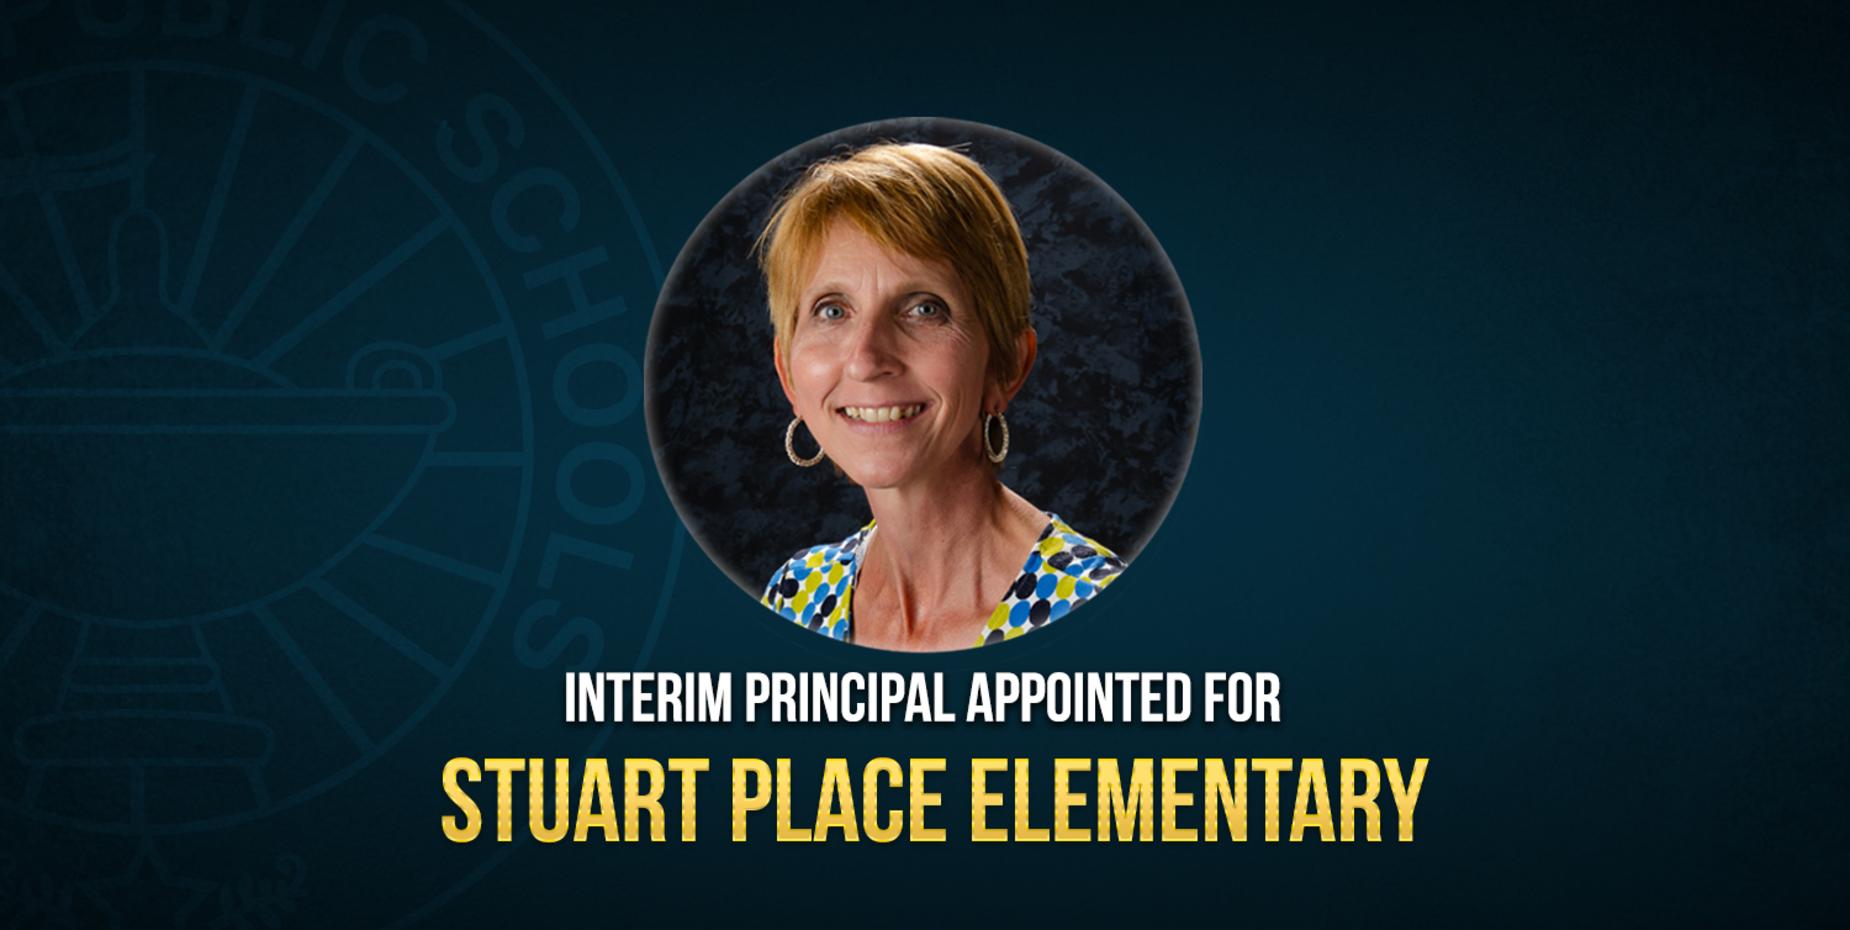 Photo of interim principal for Stuart place elementary